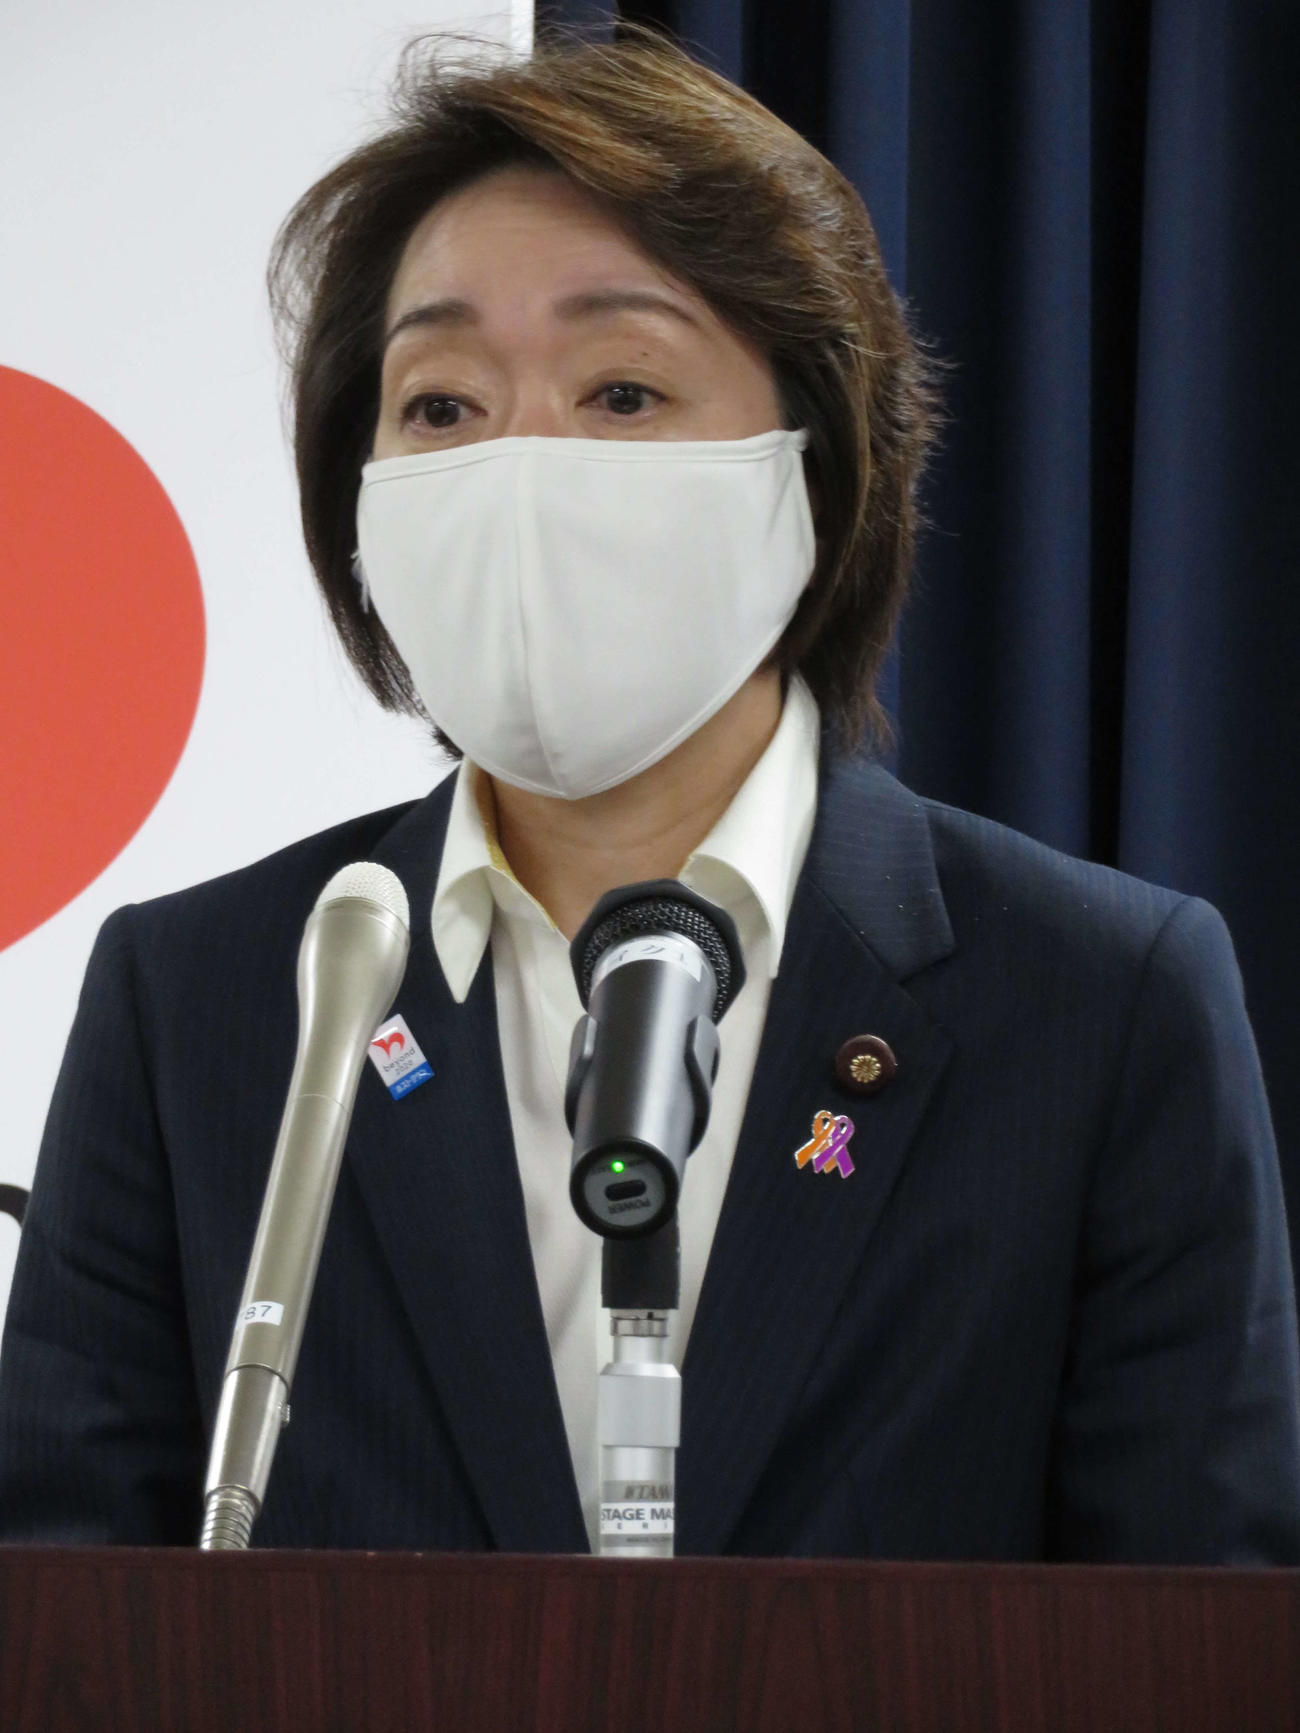 閣議後会見を行った橋本聖子五輪相(撮影・近藤由美子)